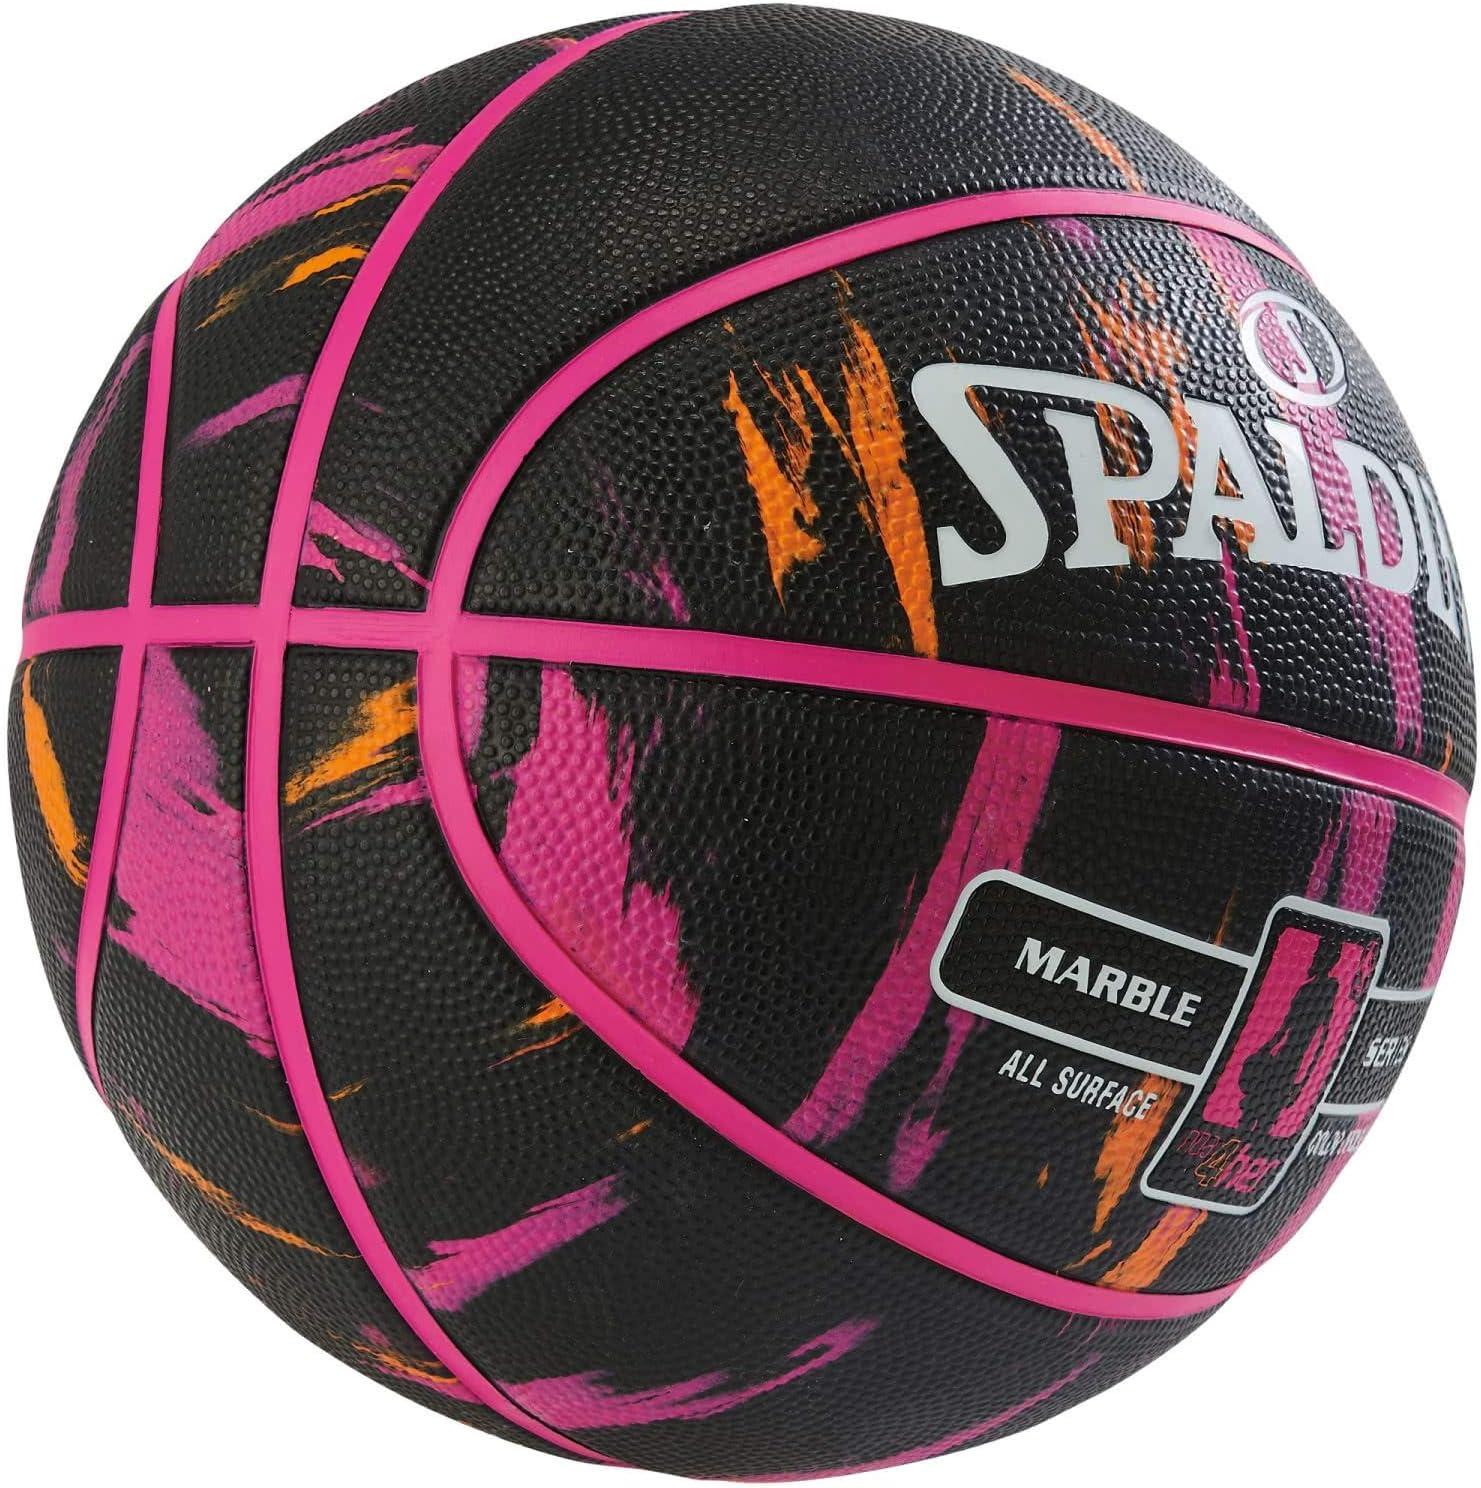 Spalding NBA Marble 4HER out SZ.6 (83-875Z) Basketballs, Juventud ...